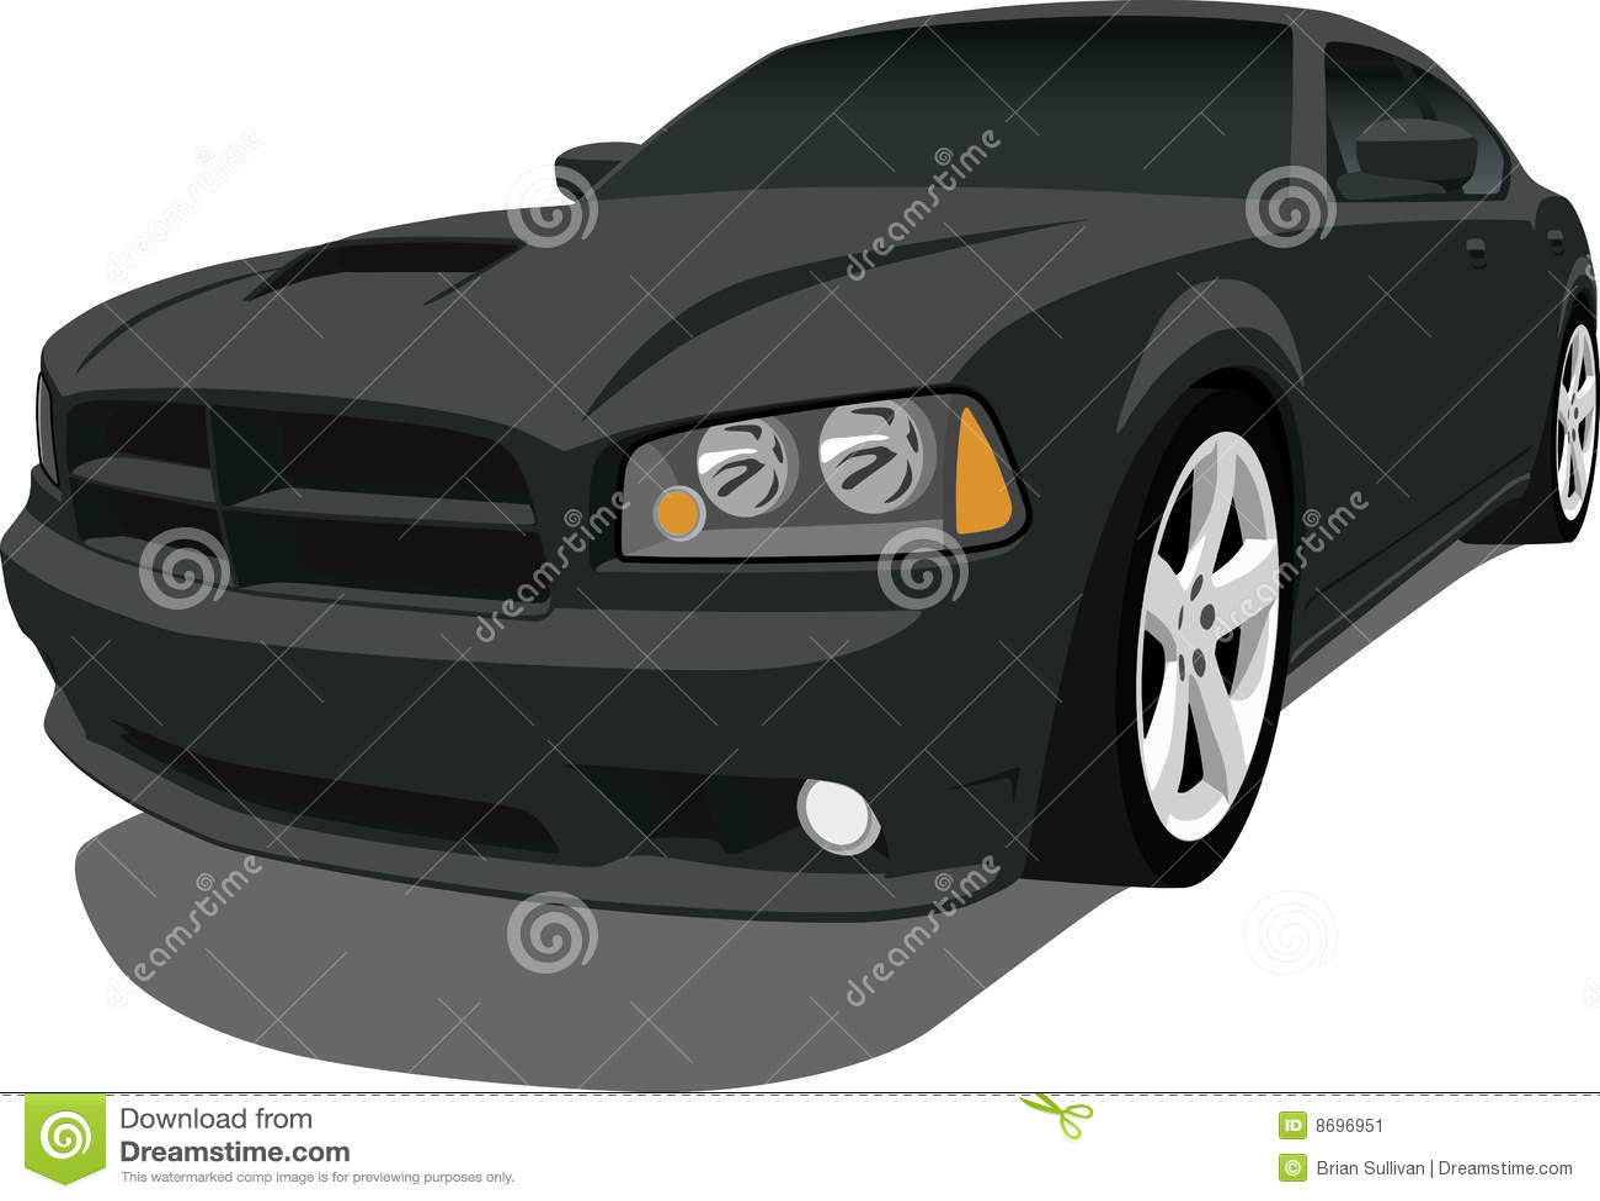 Dodge Charger Sedan Stock Vector Image Of Illustration